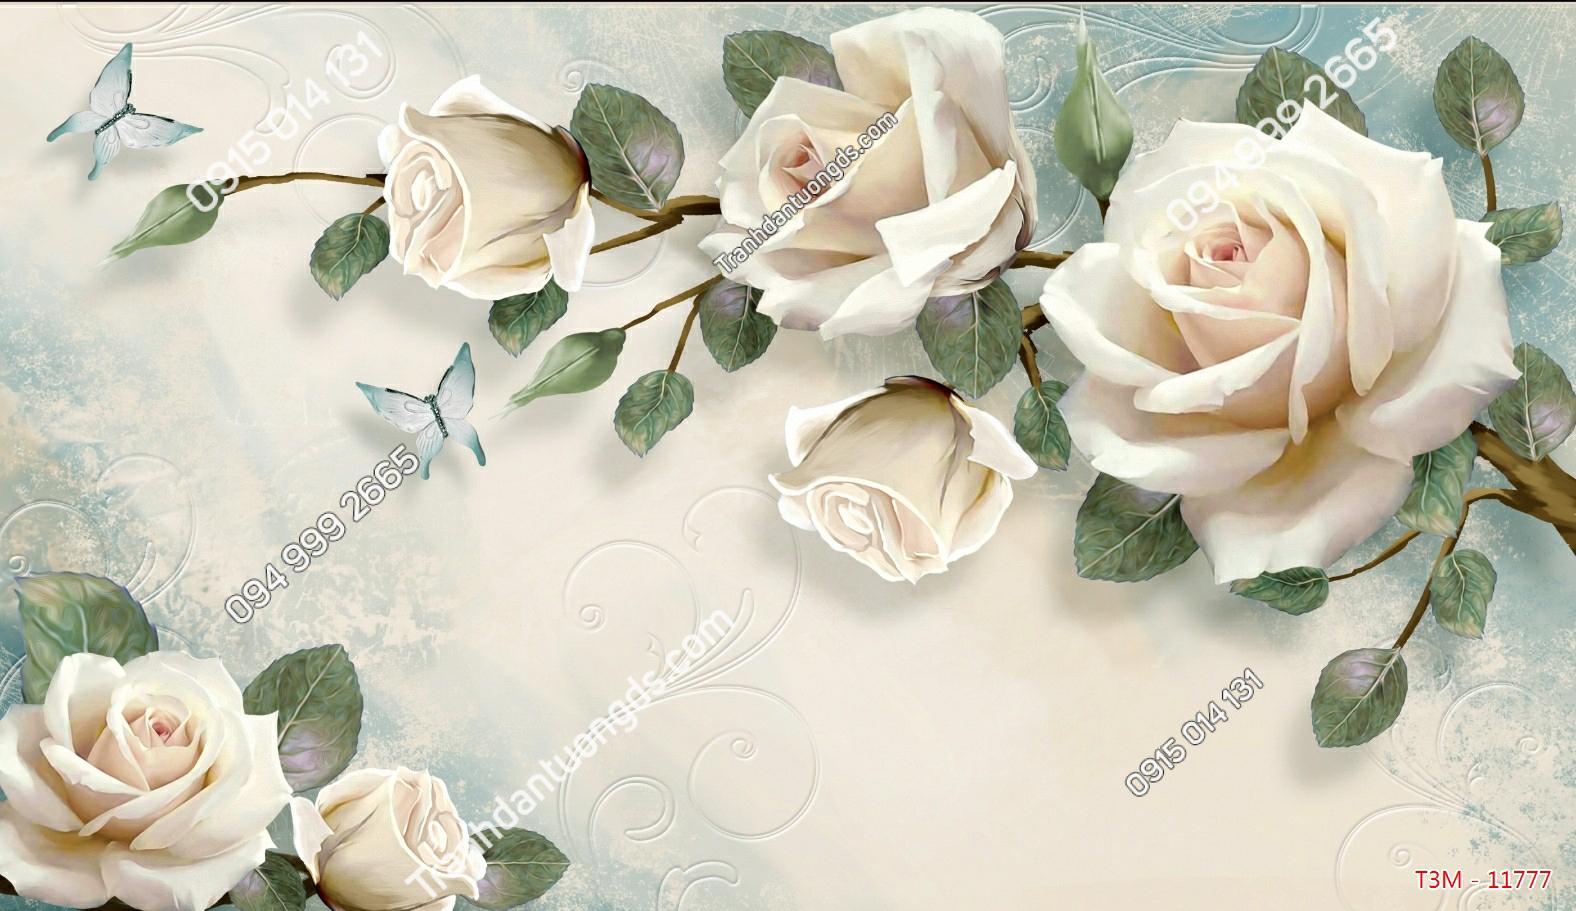 Tranh dán tường hoa hồng trắng - 11777 demo